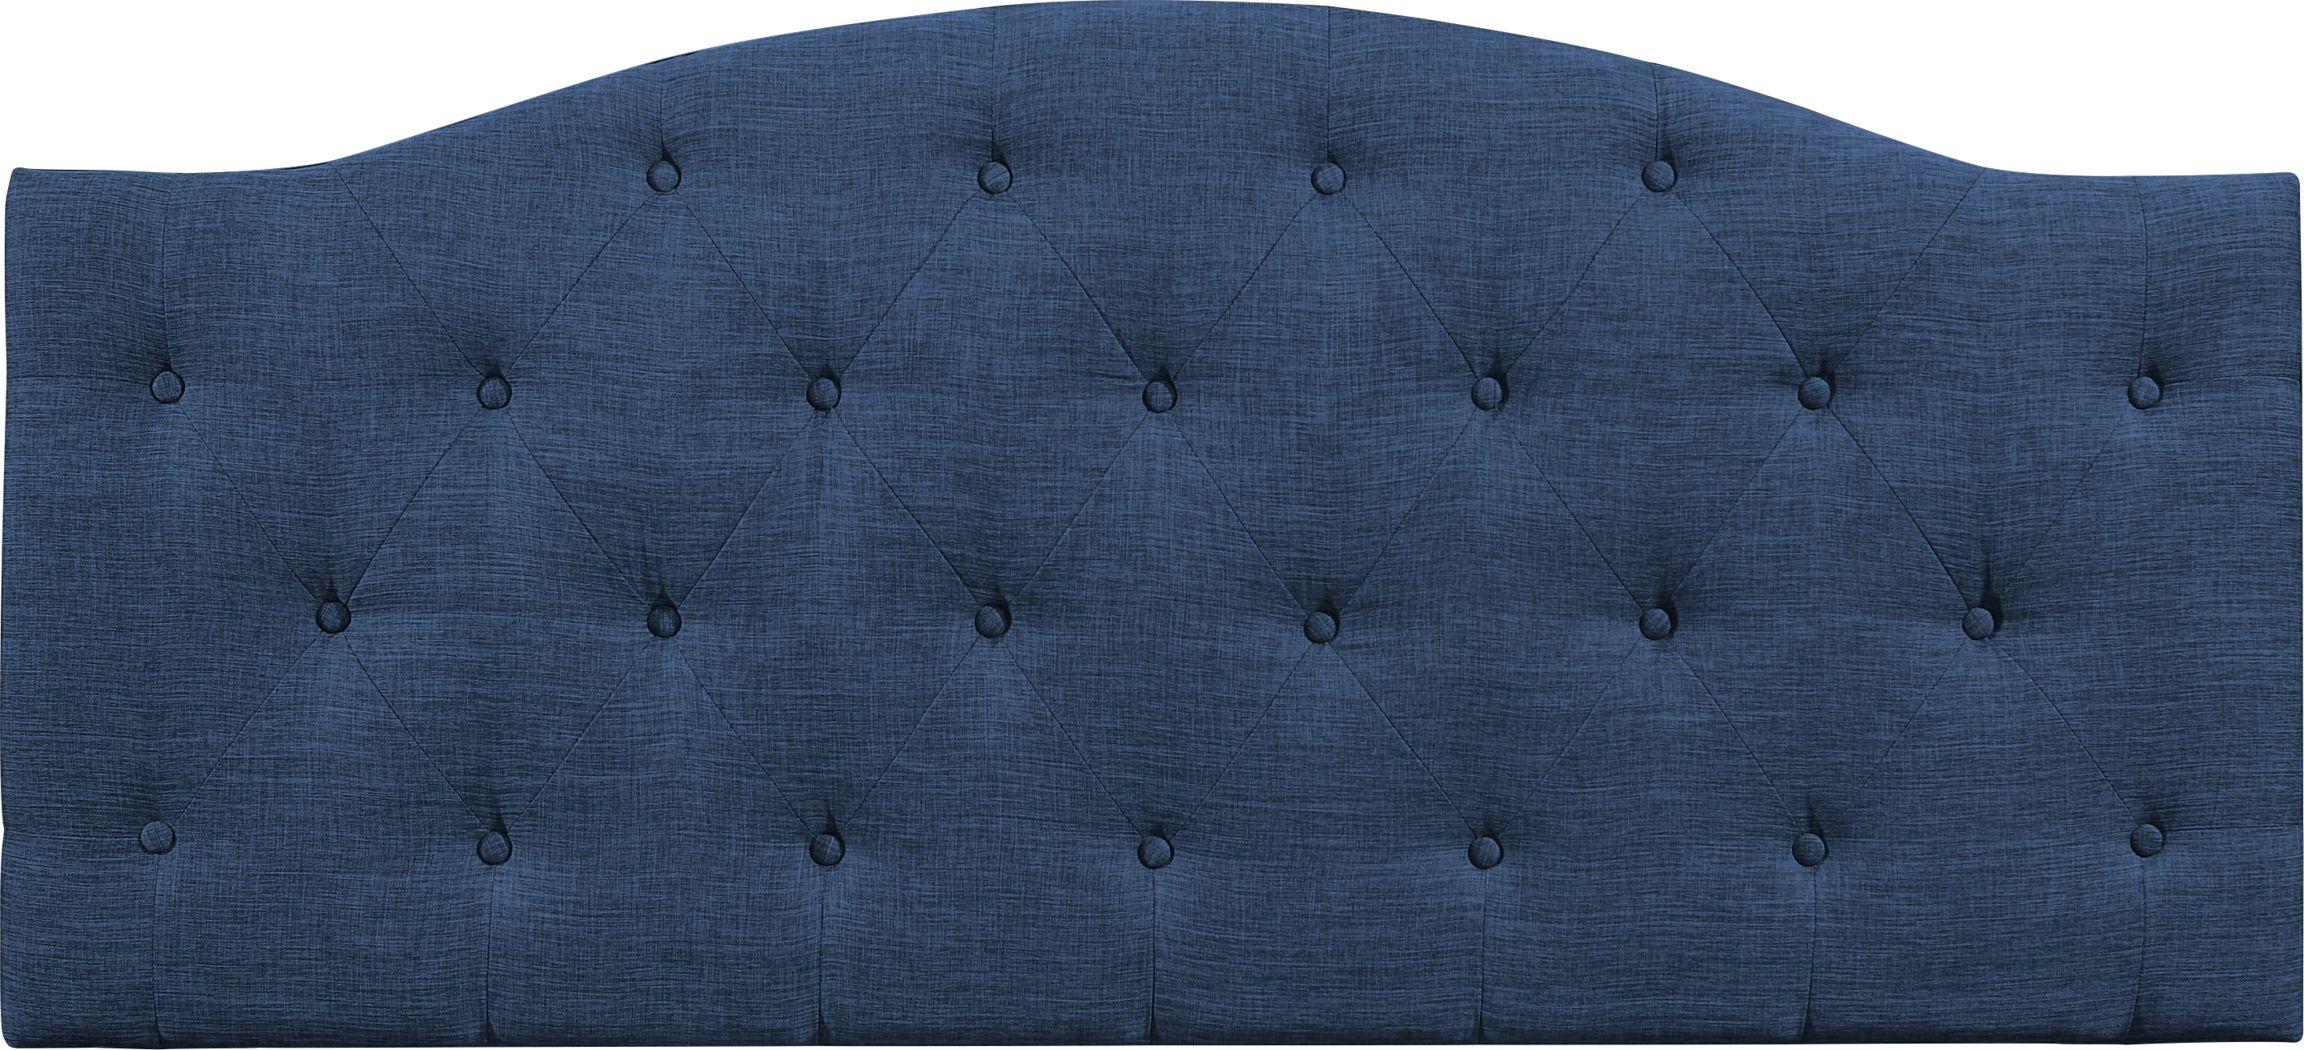 Barnsdale Blue Full/Queen Upholstered Headboard